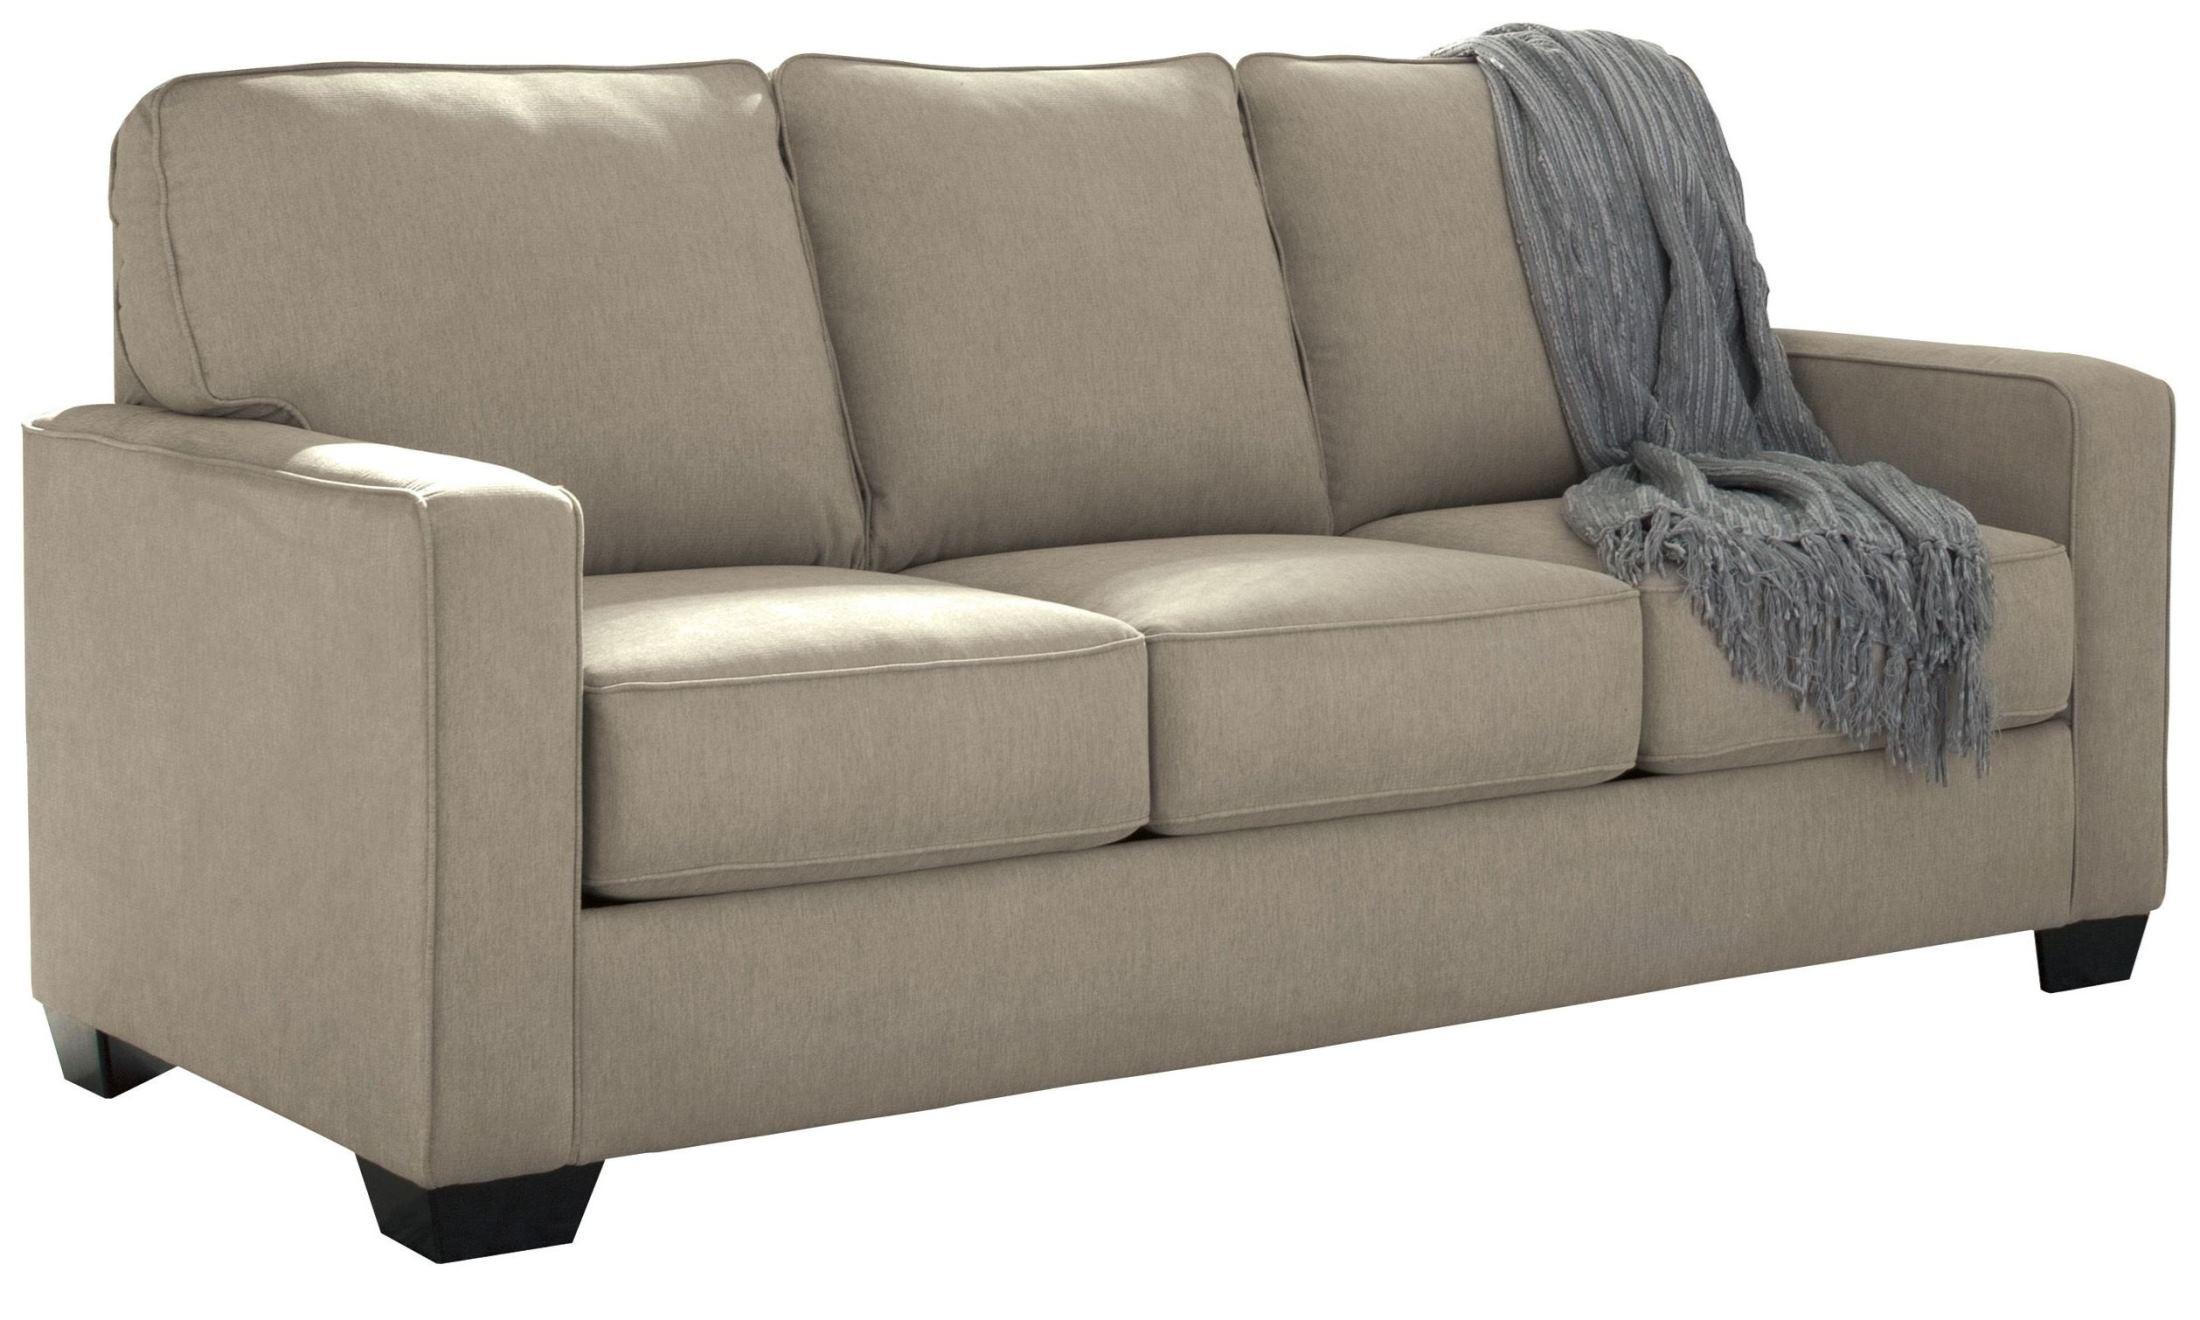 Zeb Quartz Full Sofa Sleeper From Ashley Coleman Furniture